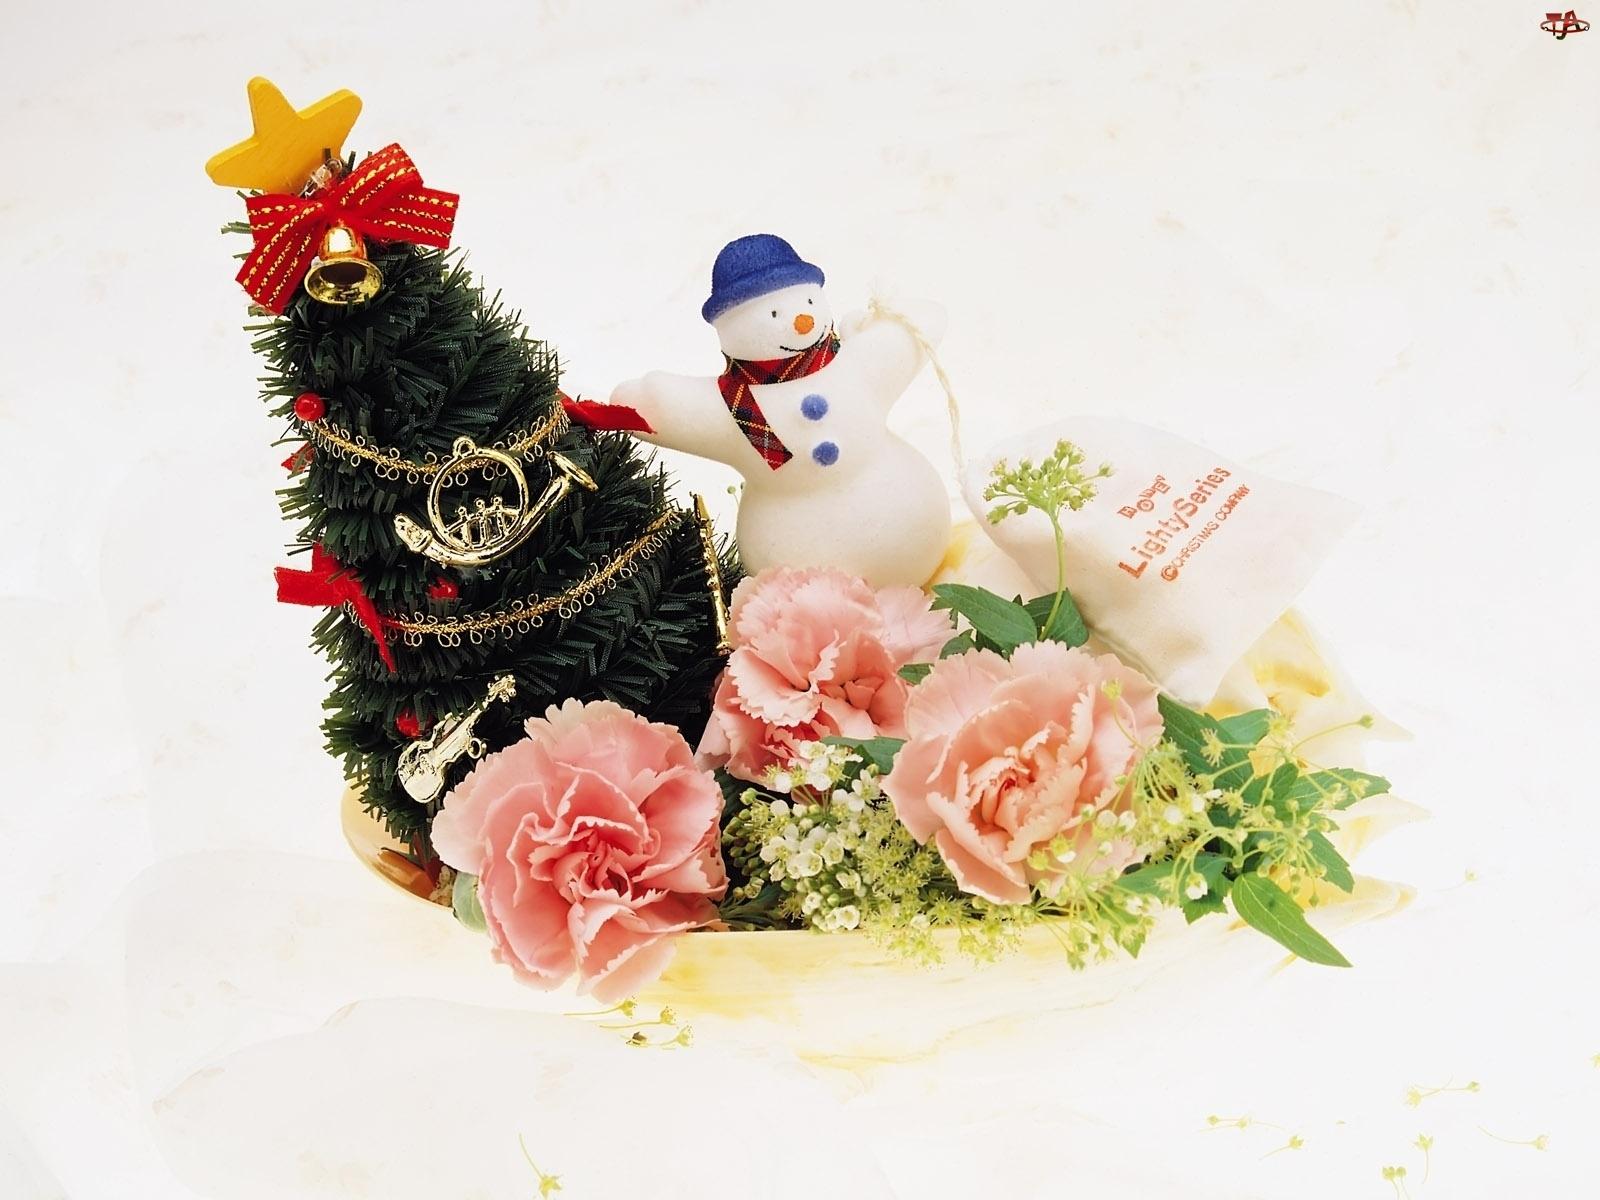 Choinka, Święta, Bałwan, Stroik